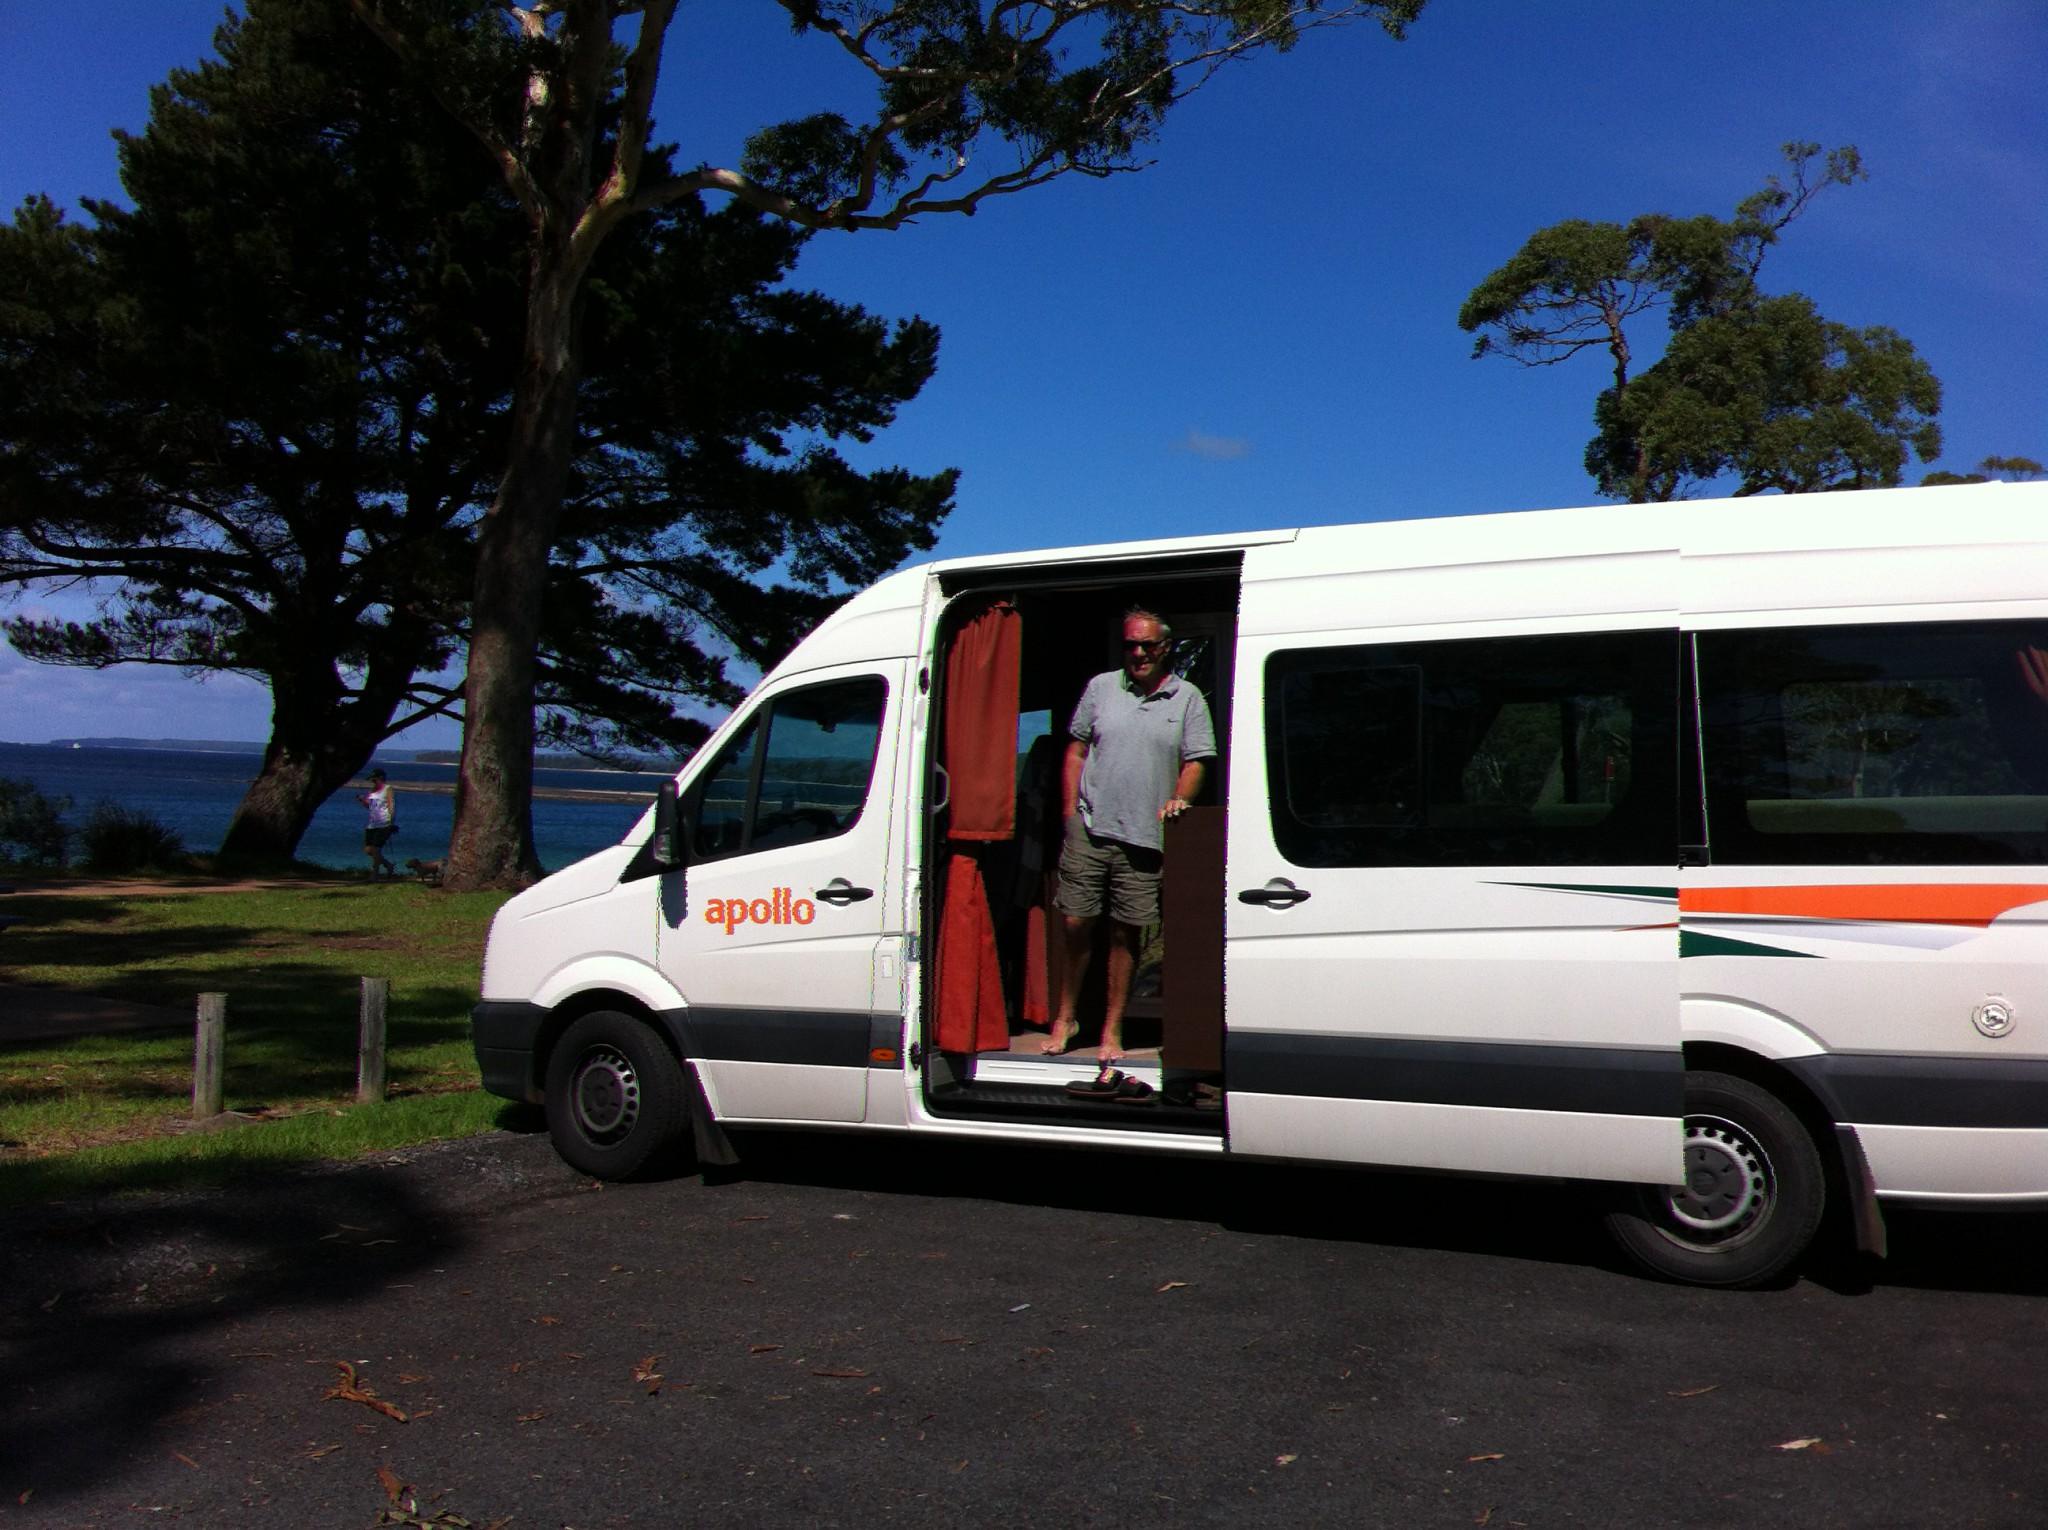 Melbourne to Sydney drive, our campervan